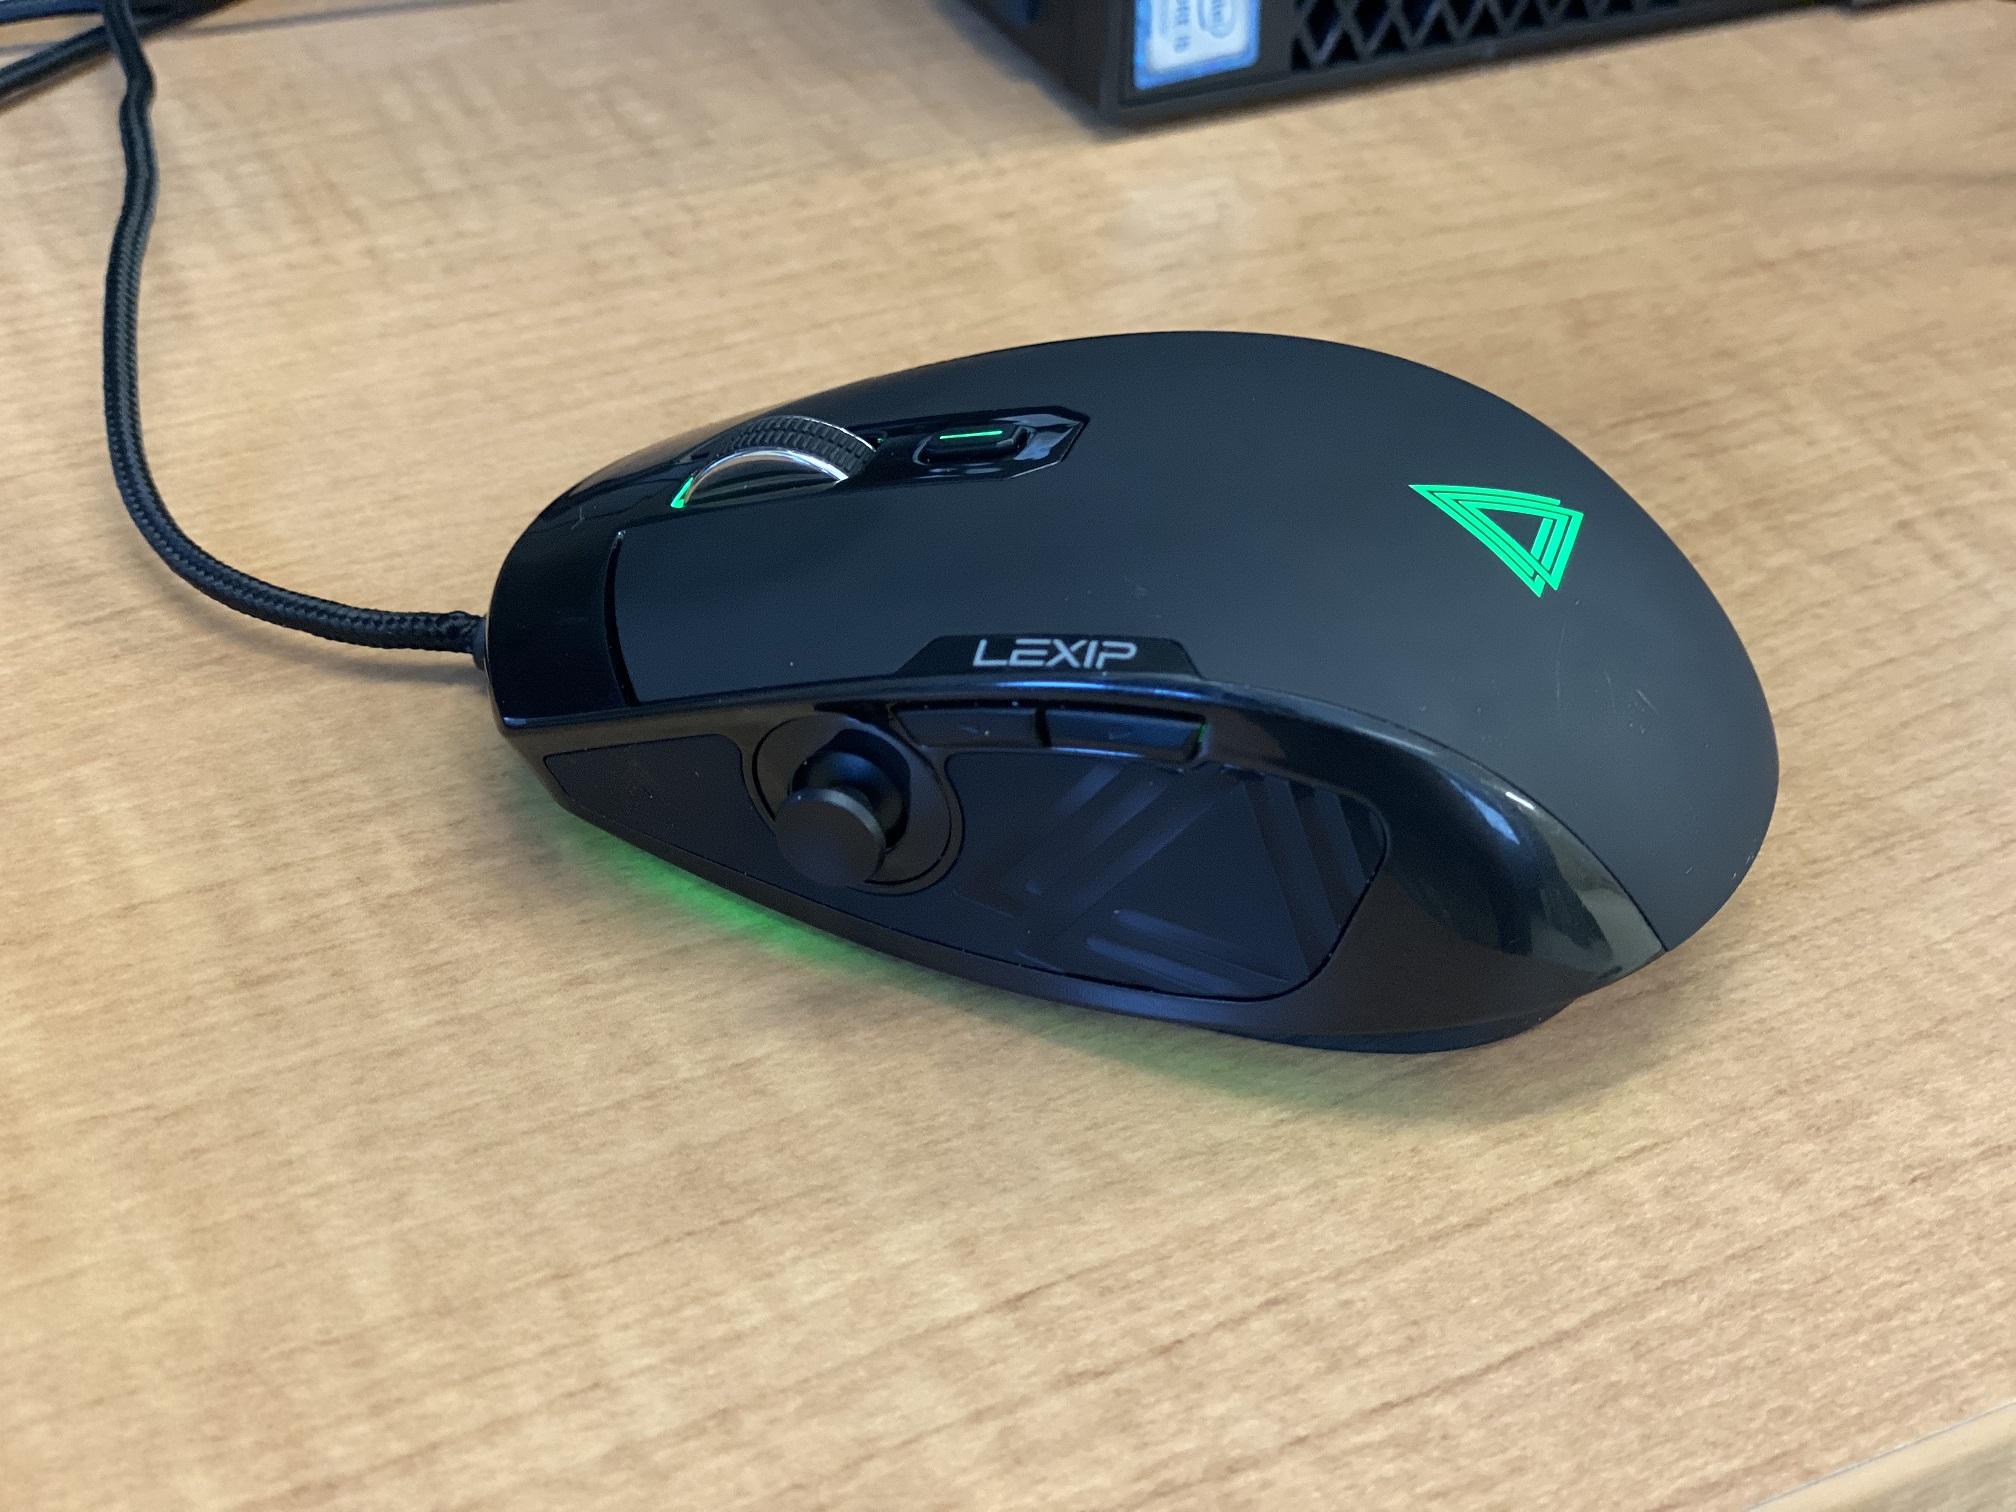 Lexip Mouse 2.5 View